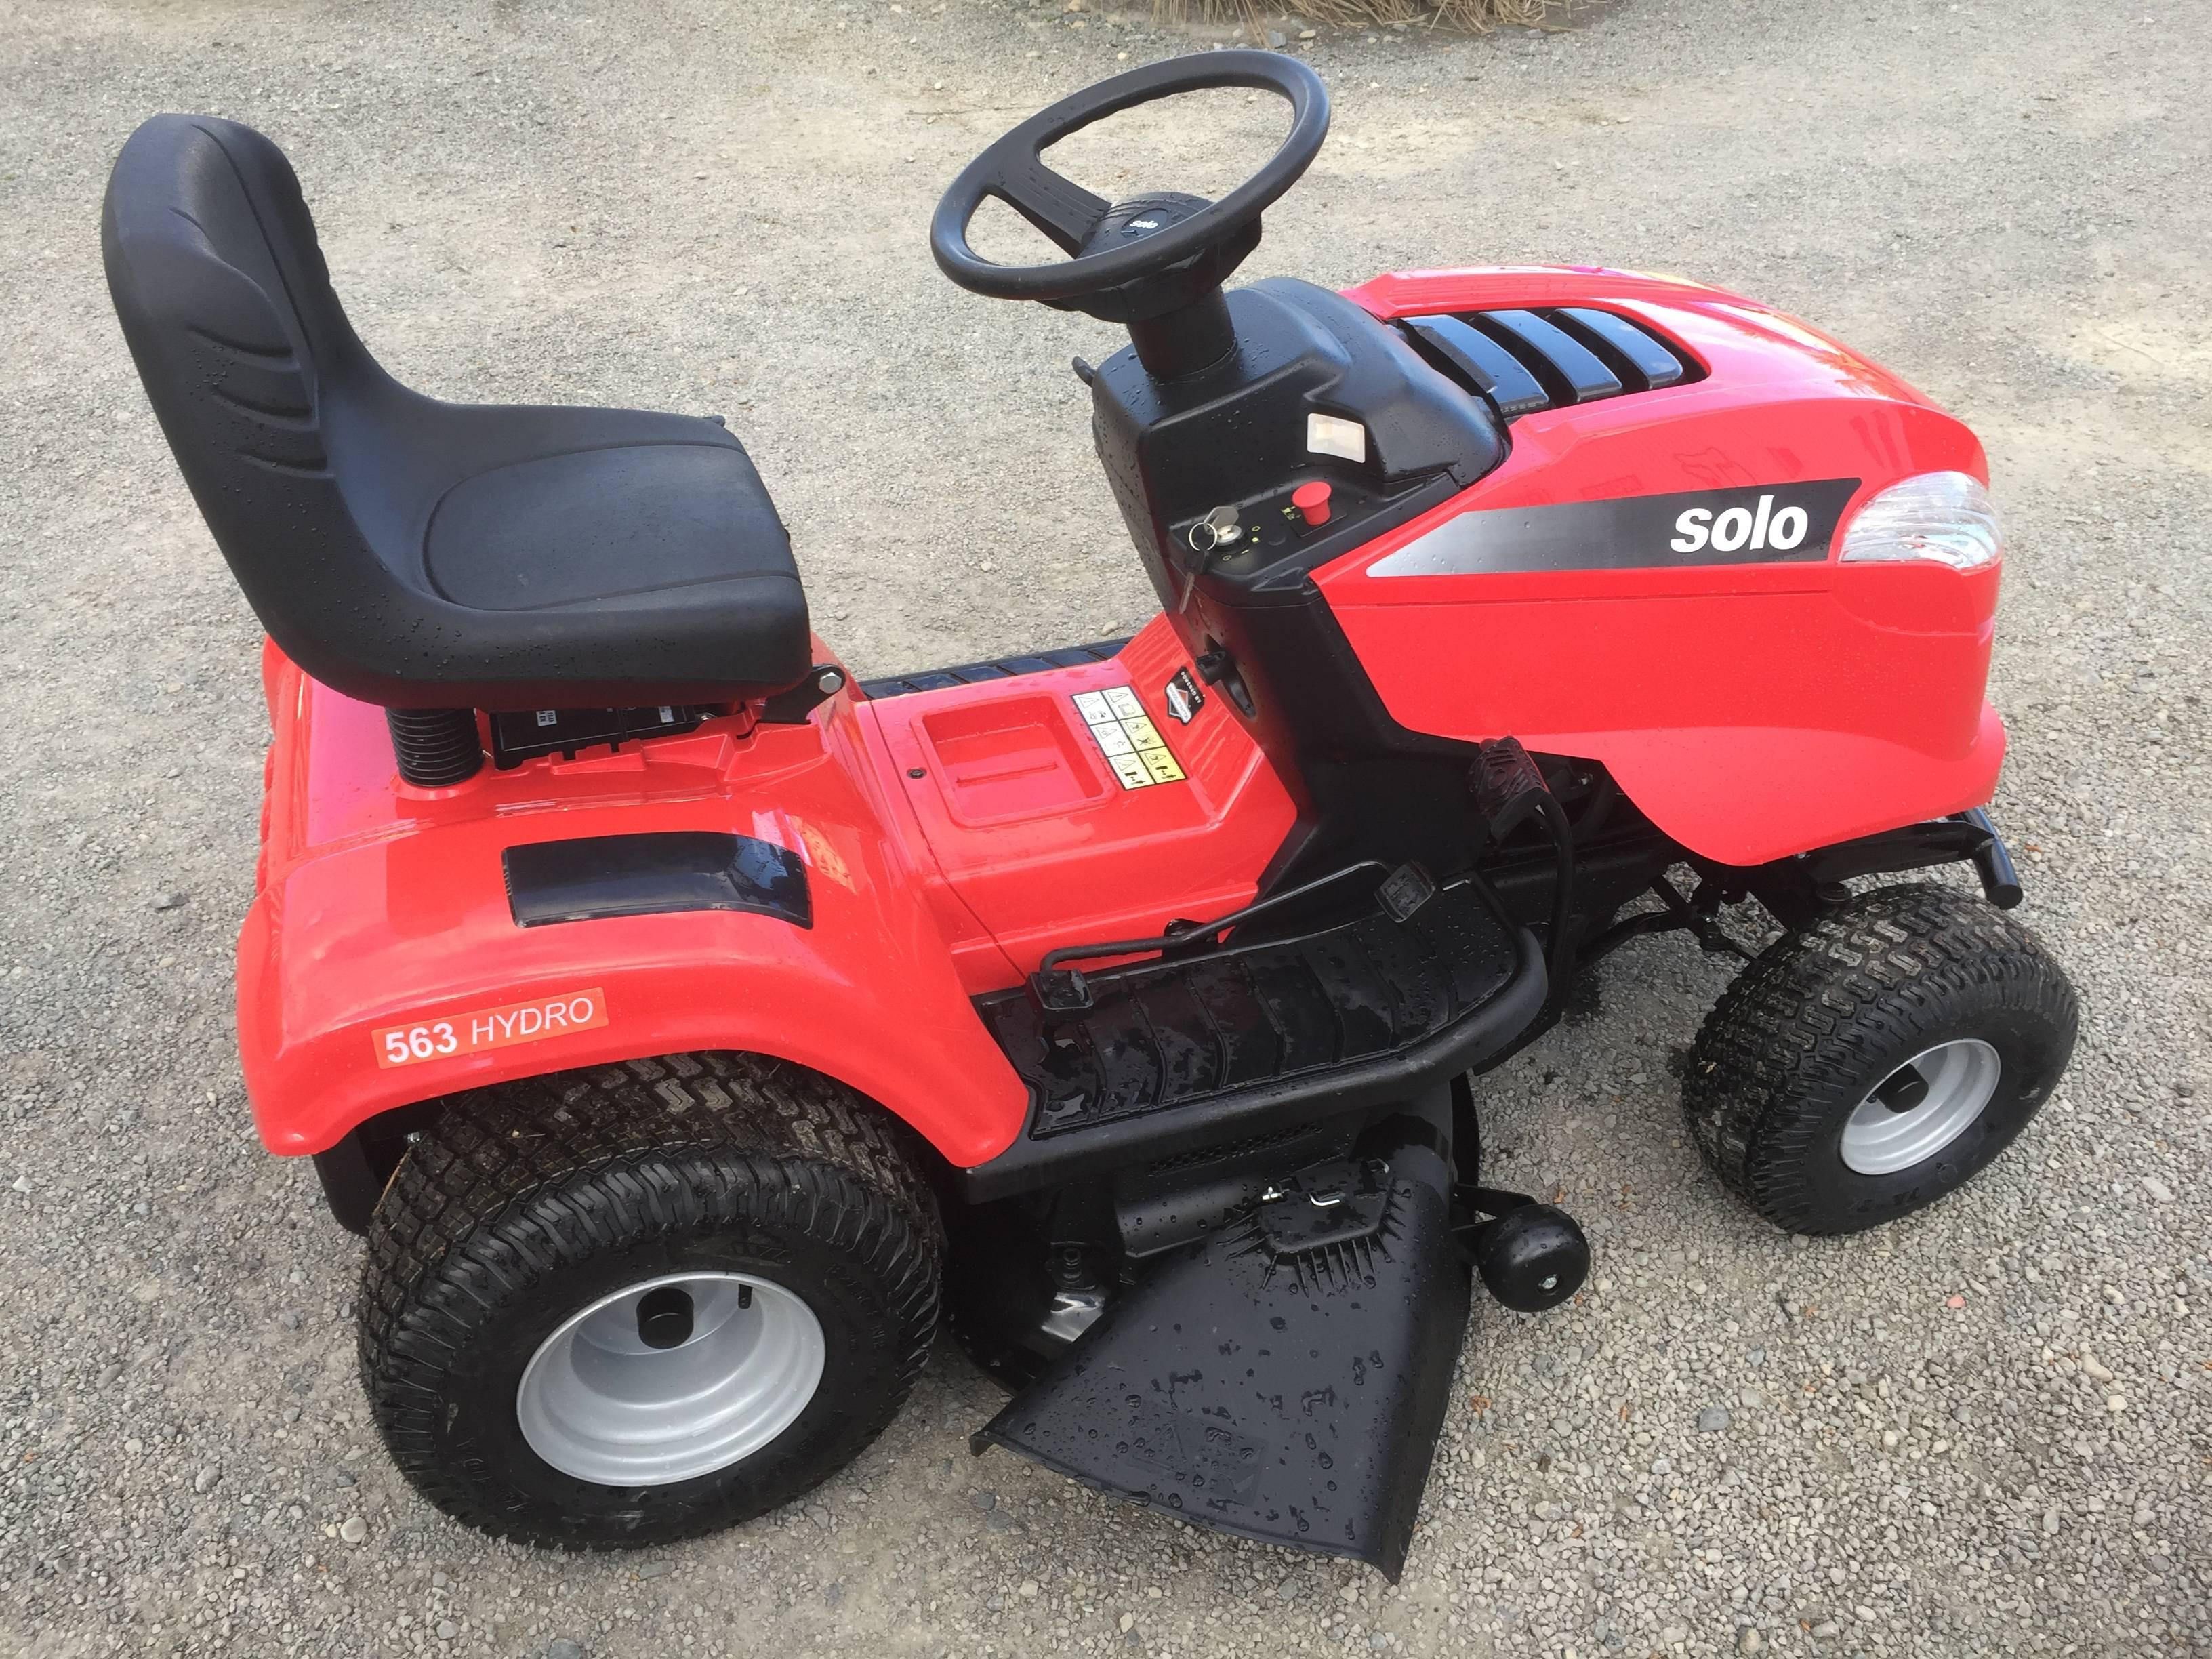 Solo 563 Hydro Lawn Mower